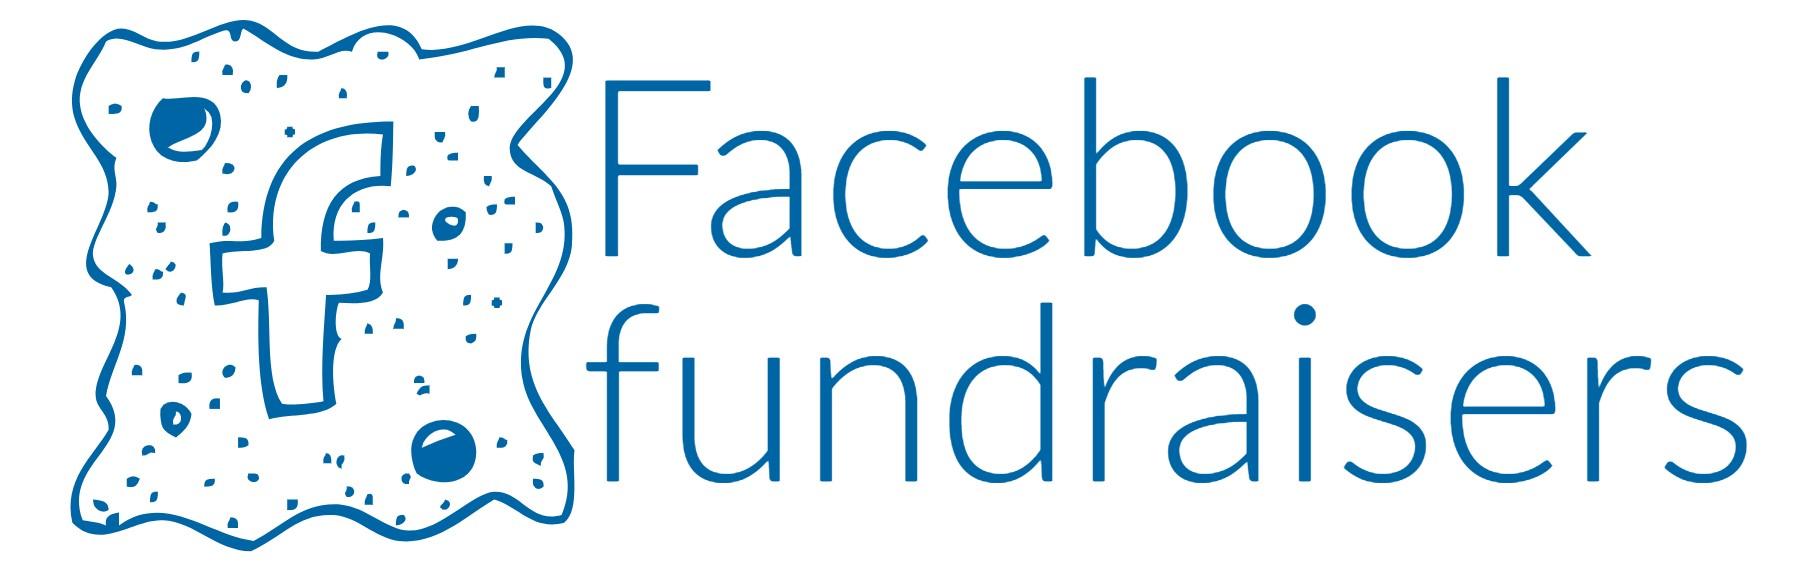 facebook_fundraisers.jpg